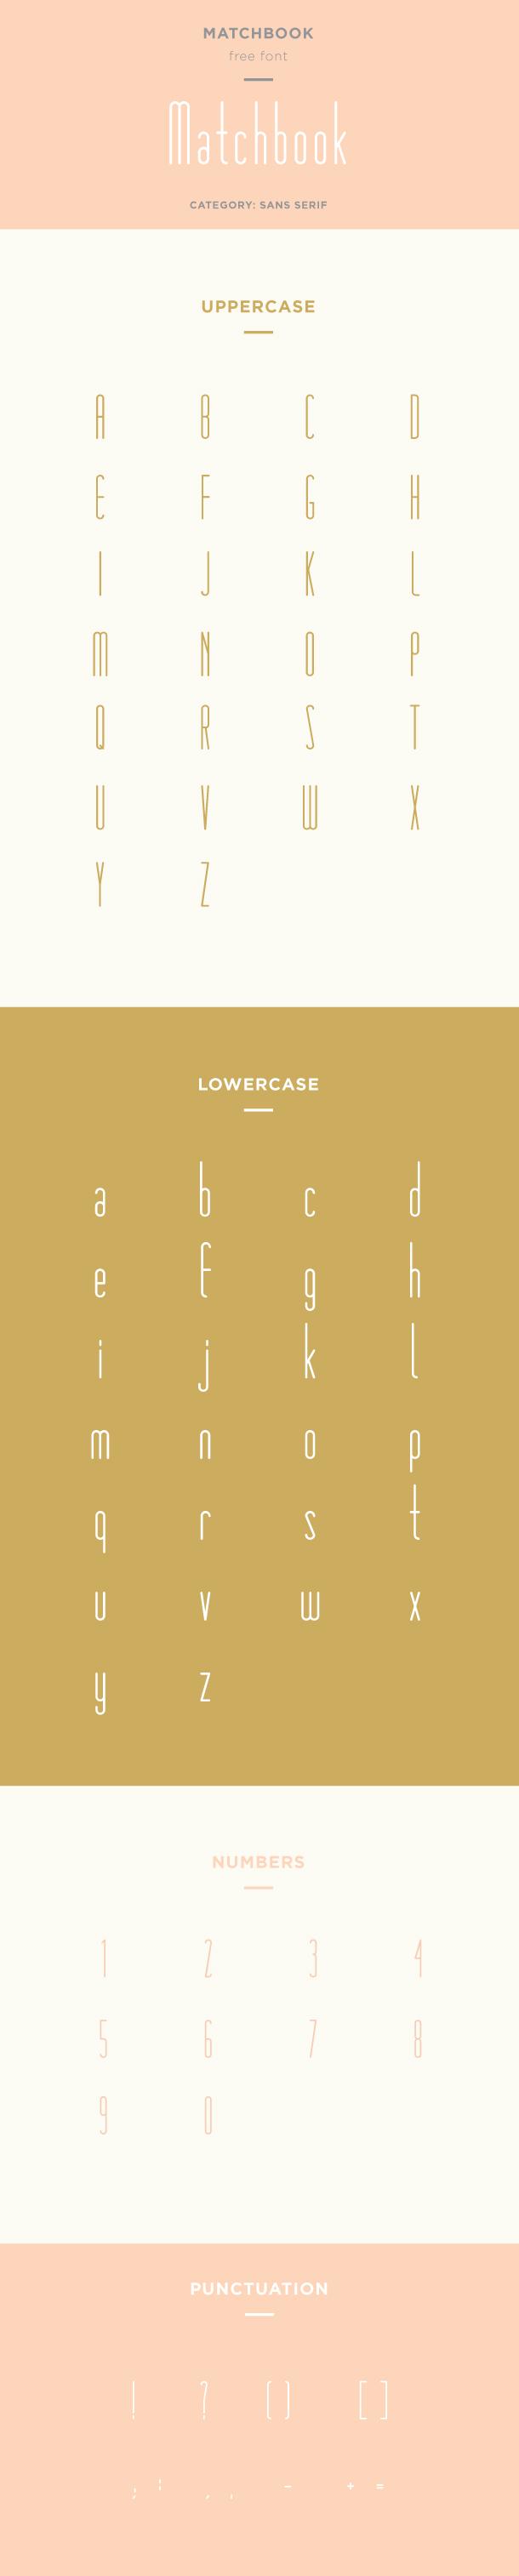 matchbook font example